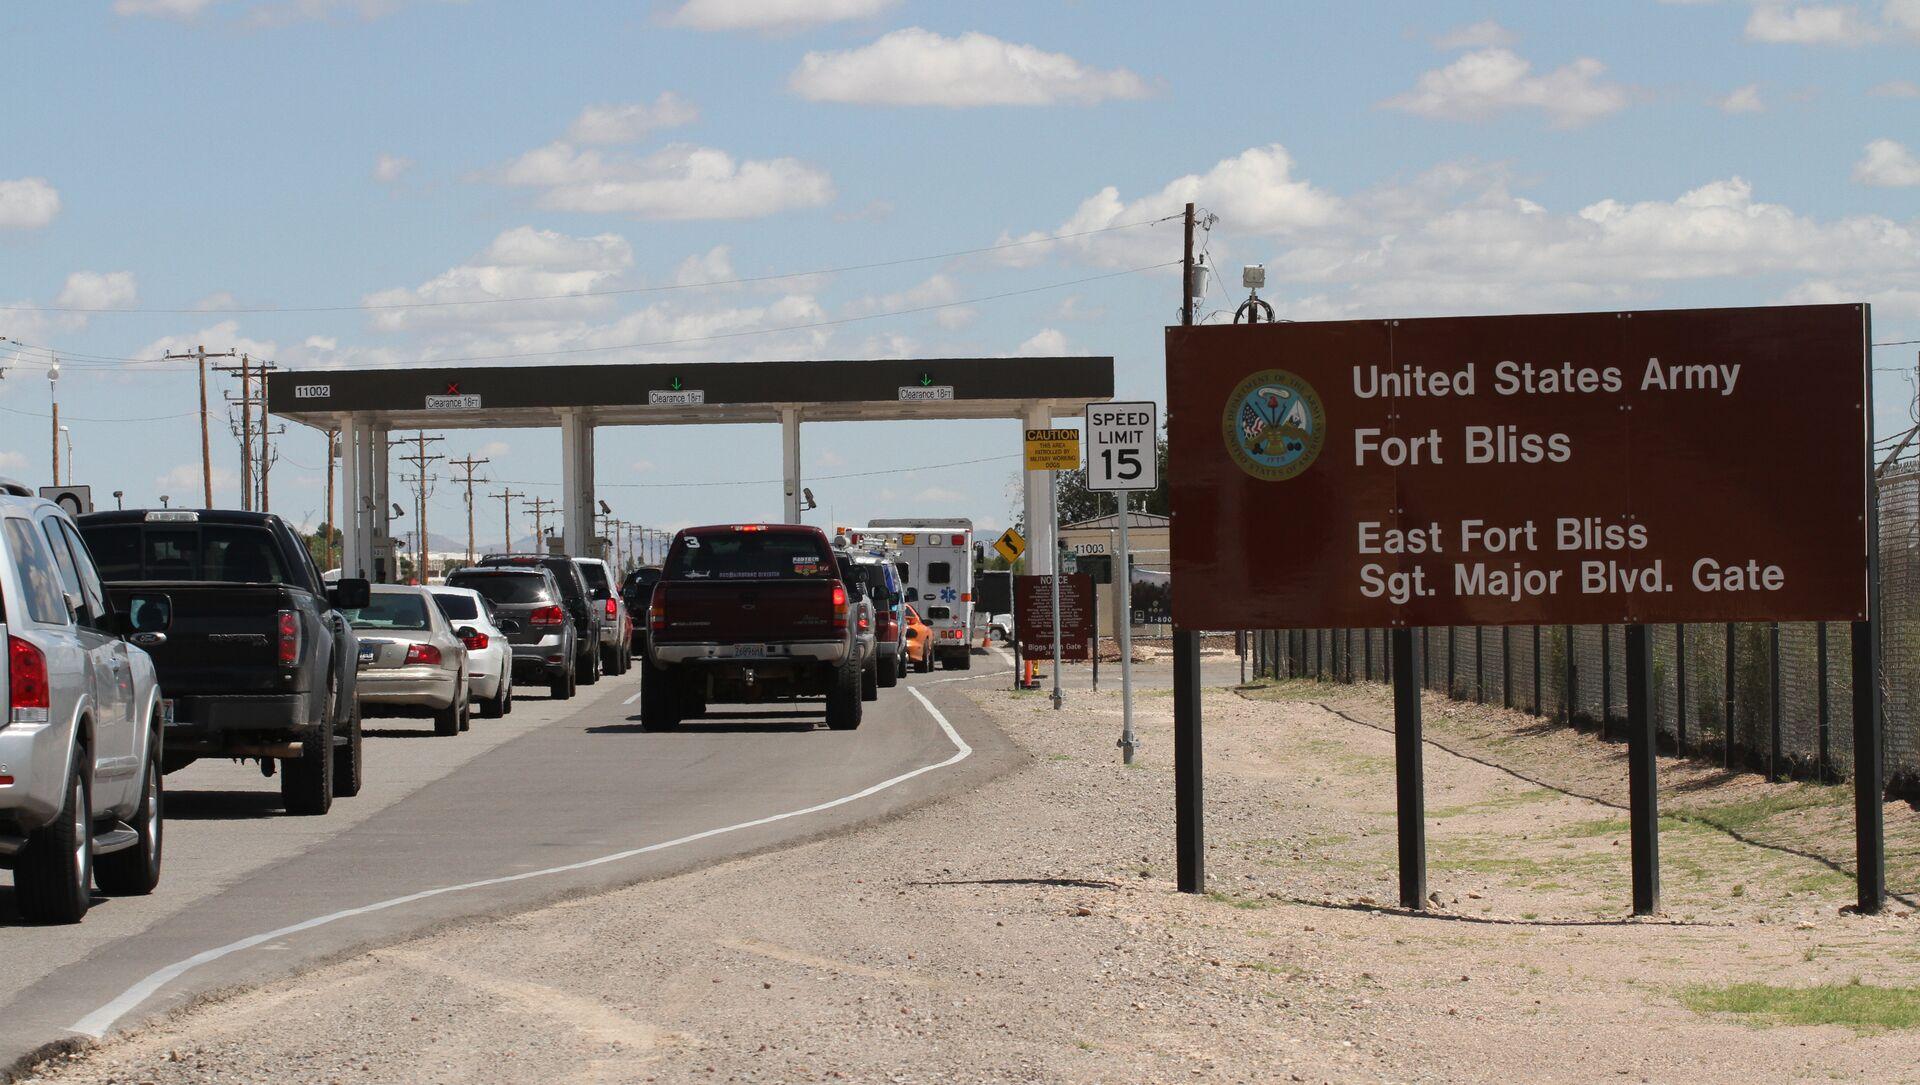 Cars wait to enter Fort Bliss in El Paso, Texas, Tuesday Sept. 9, 2014 - Sputnik International, 1920, 28.07.2021